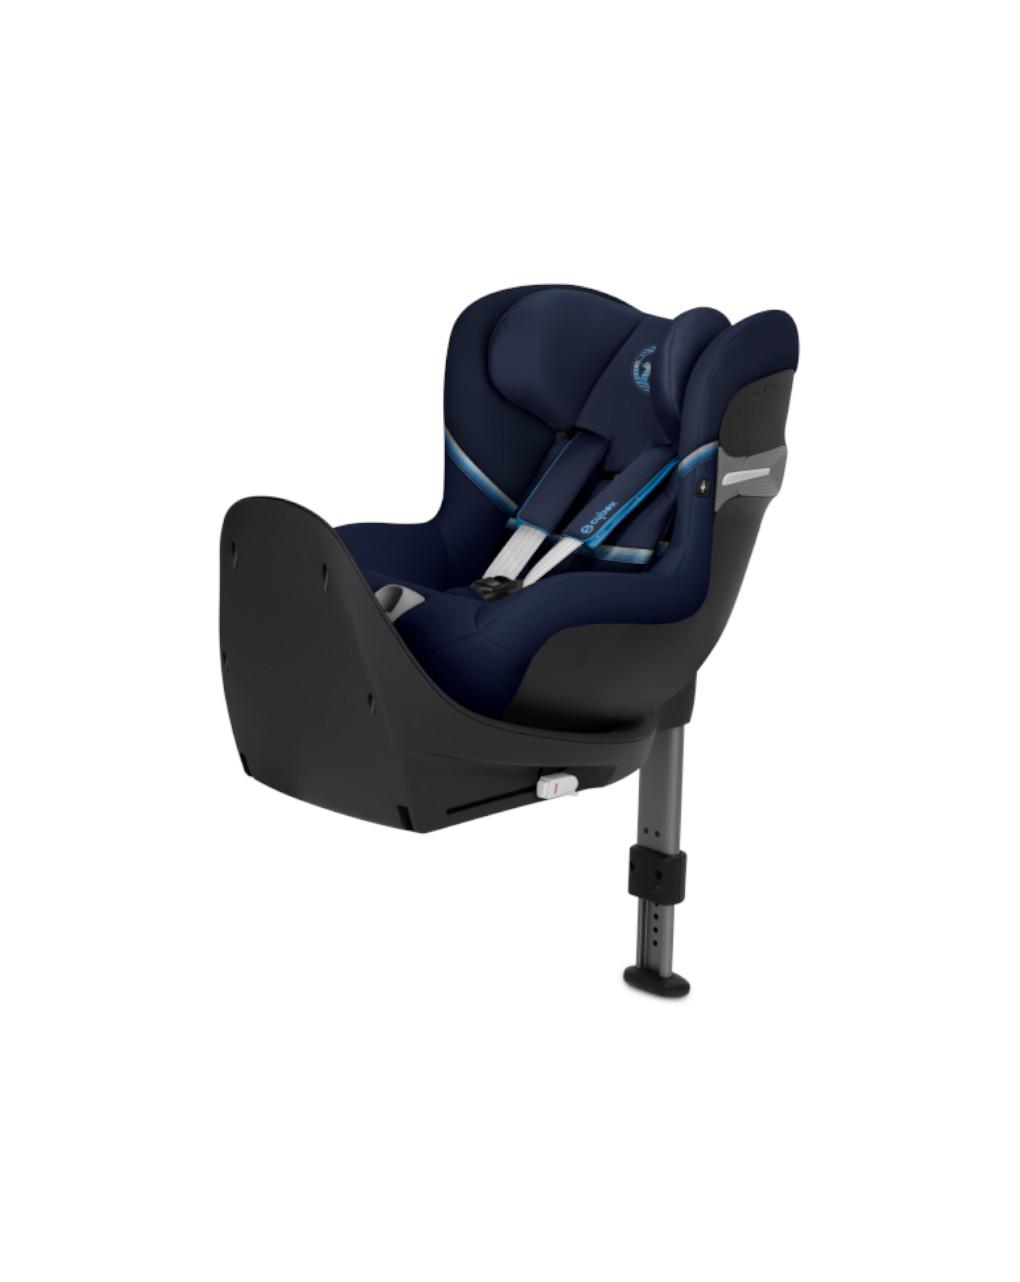 Cybex Κάθισμα Αυτοκινήτου Sirona S I-Size Navy Blue